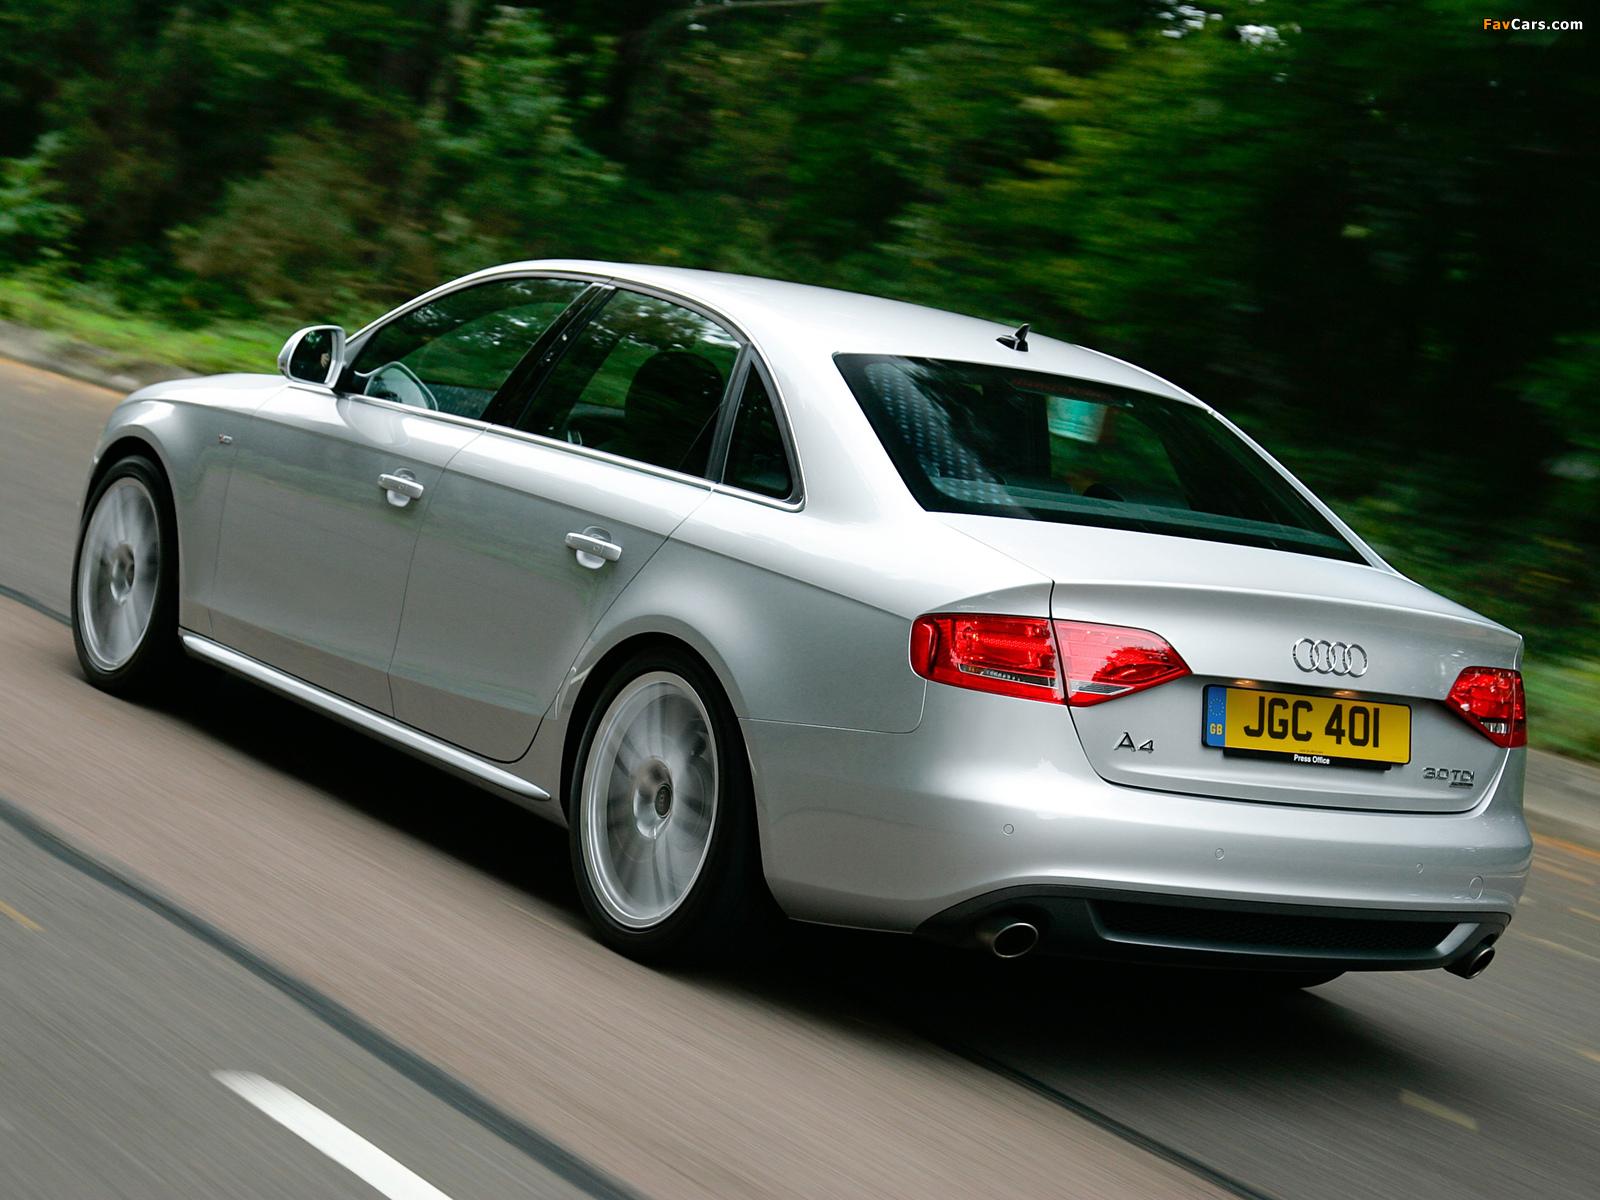 Pictures Of Audi A4 3 0 Tdi S Line Sedan Uk Spec B8 8k